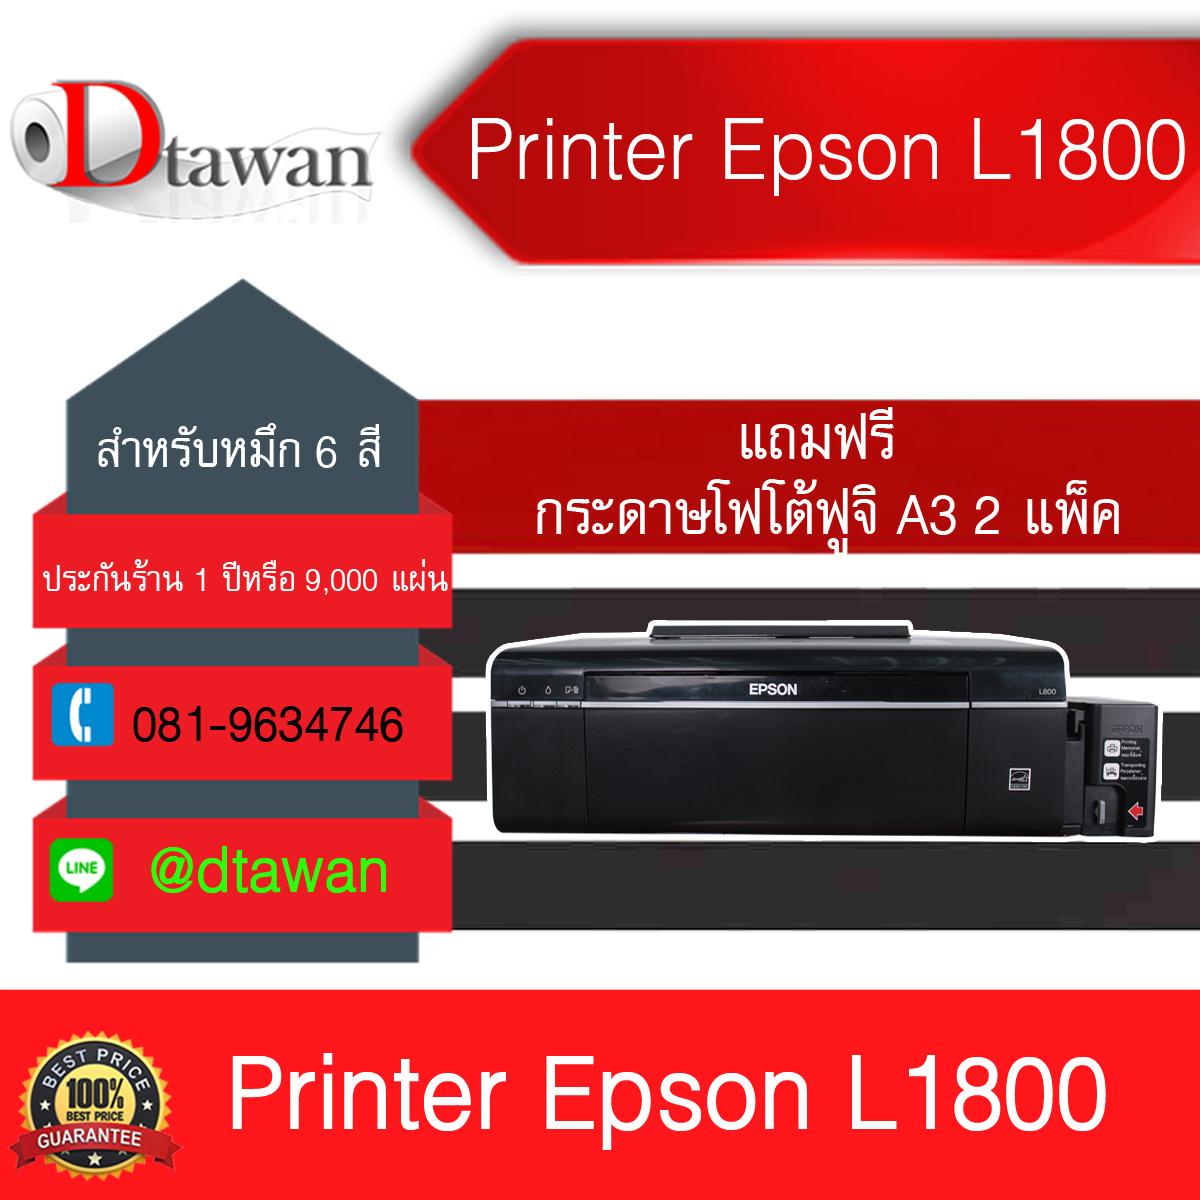 EPSON L1800 ปริ้นเตอร์ ติดแท้งค์ 6สีจากโรงงาน พิมพ์ได้สูงสุดขนาดA3+ แถมฟรี กระดาษโฟโต้ฟูจิ A3 2แพค ราคาถูกที่สุด !!!